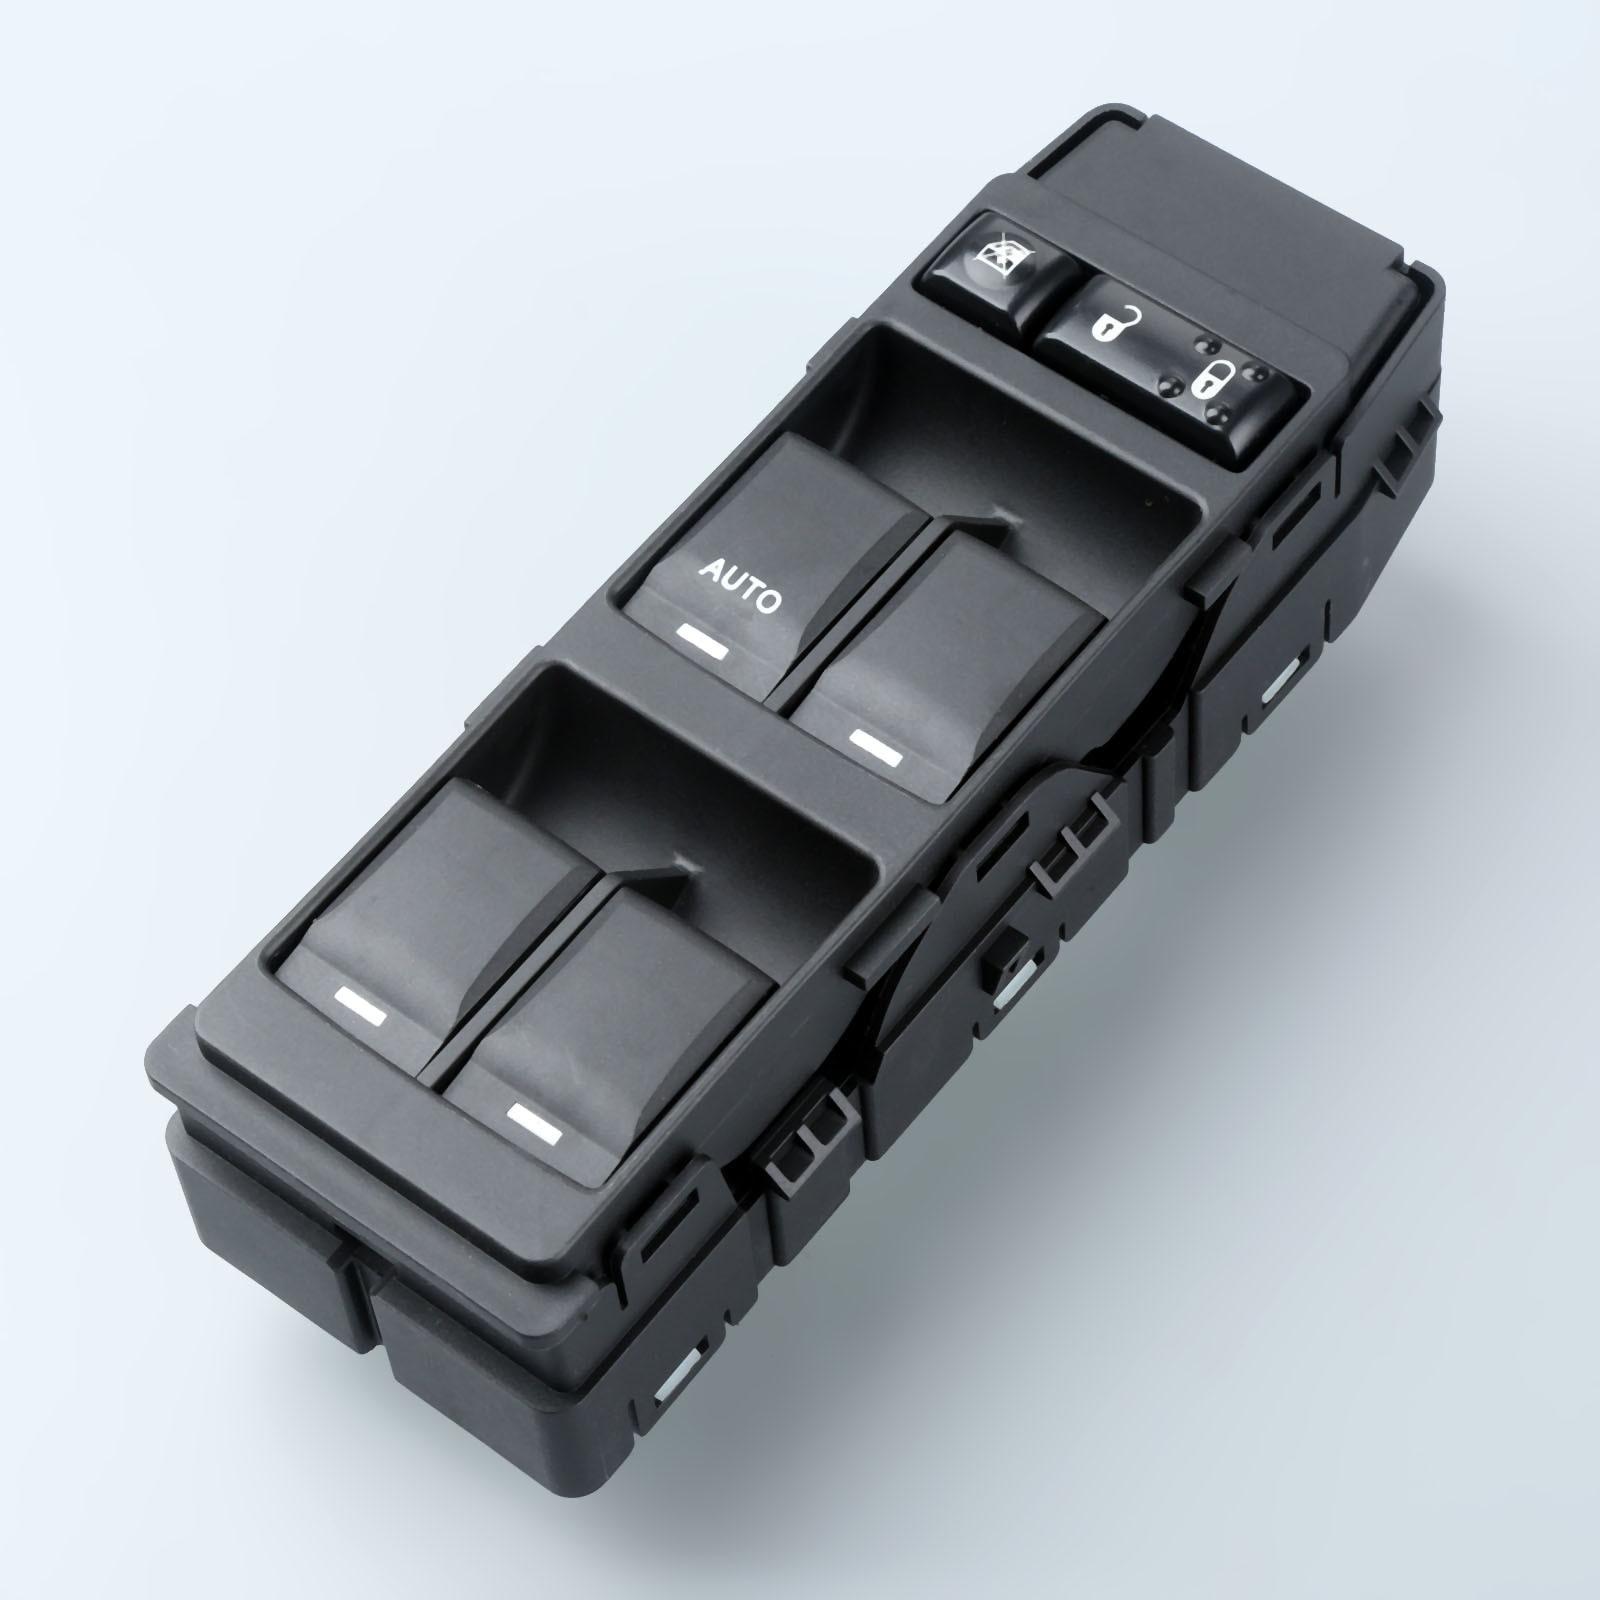 Car Power Window Master Control Switch For Chrysler Sebring Dodge Avenger Caliber Charger Dakota Durango Magnum Jeep Patriot